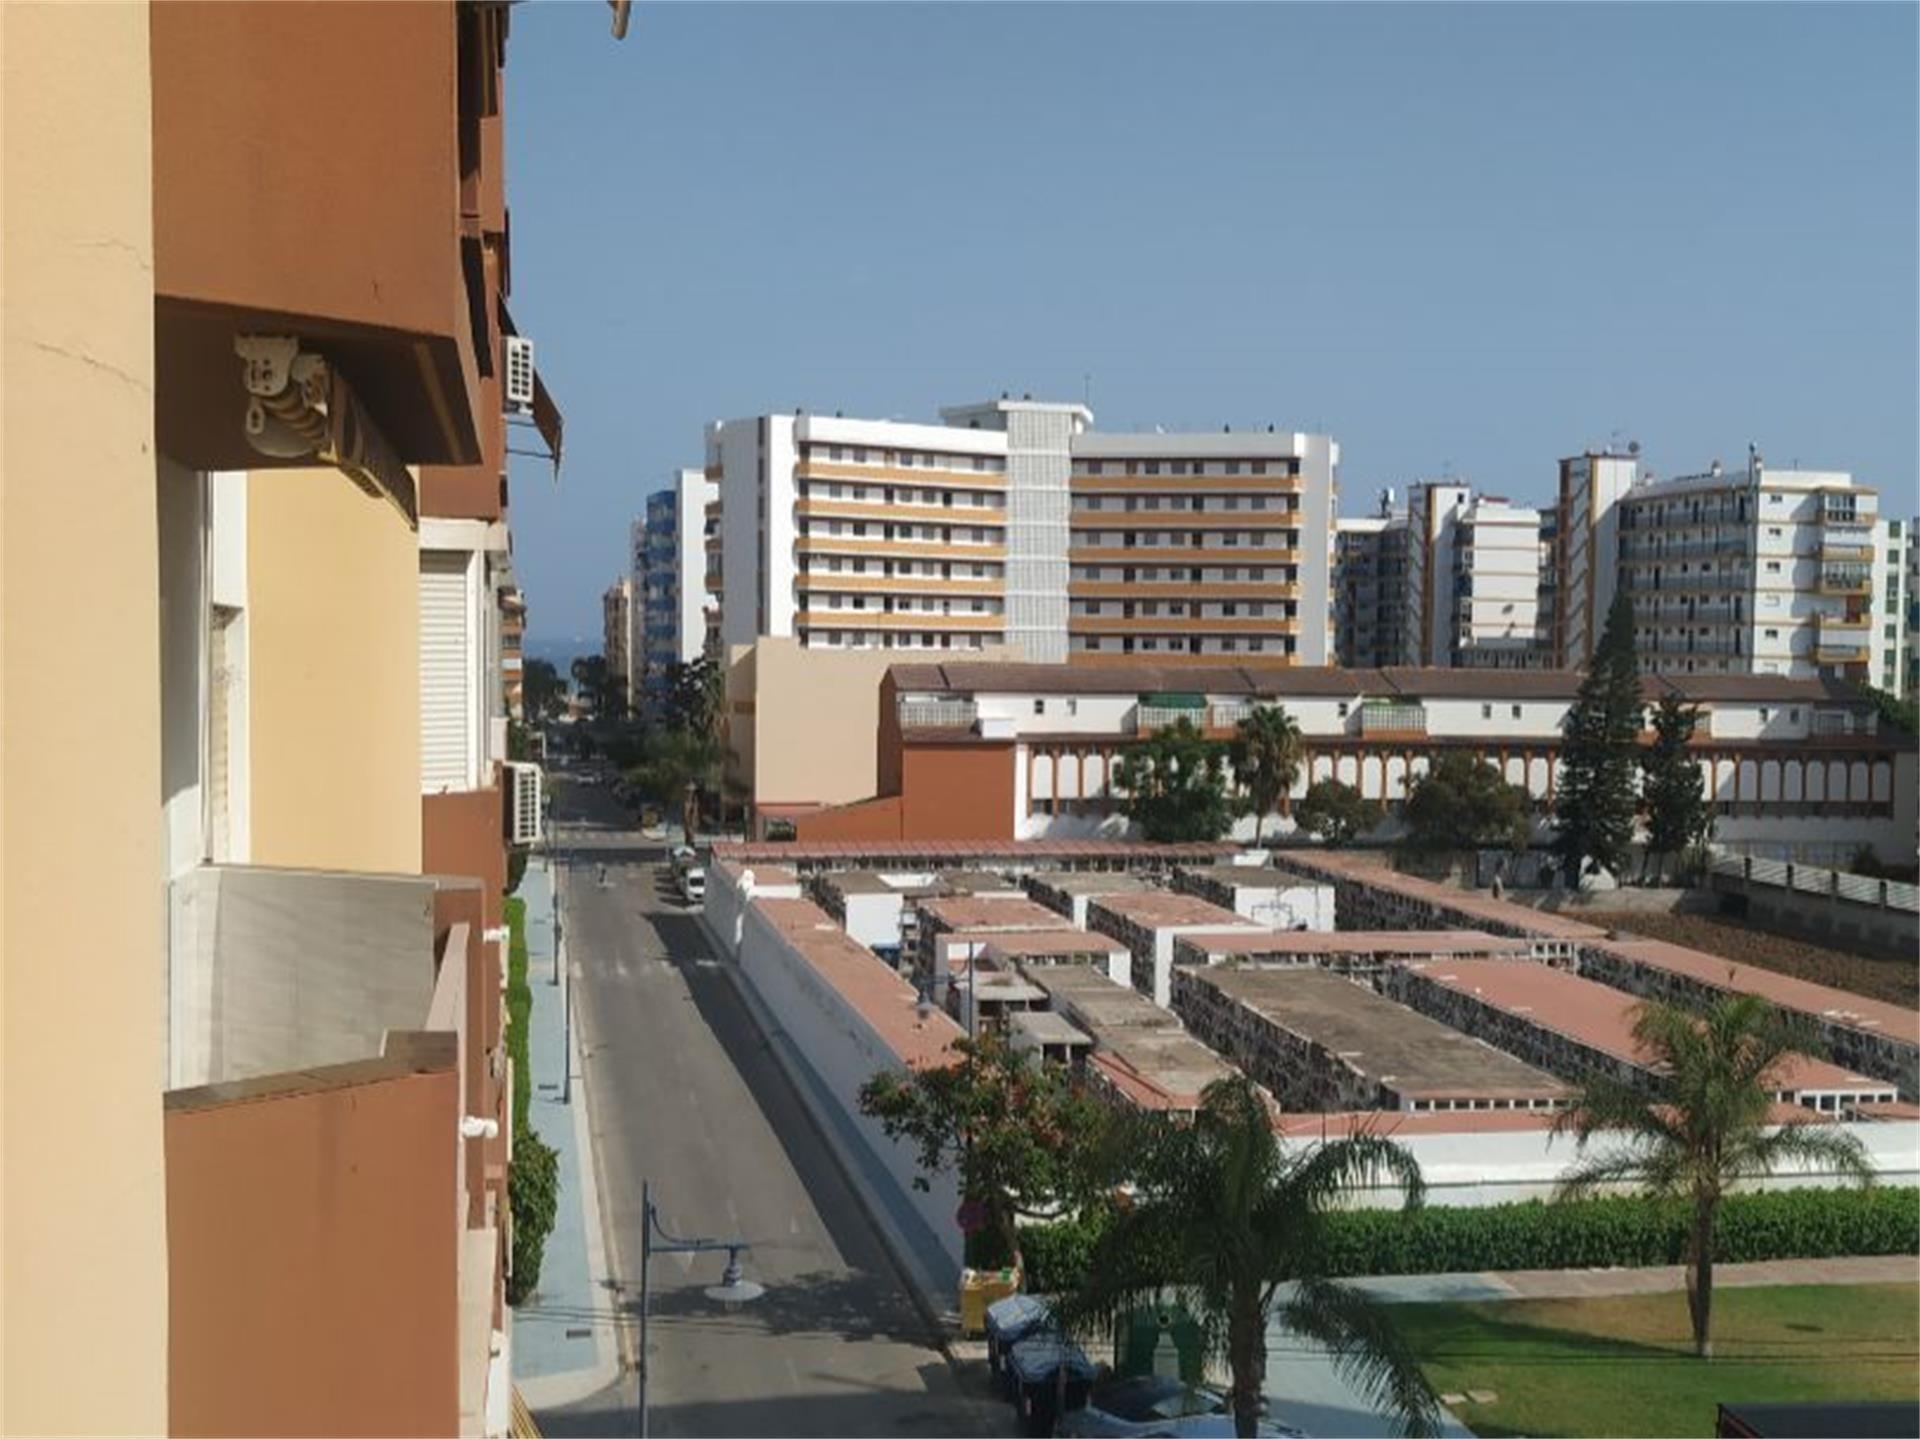 Piso de alquiler en Calle Azucarera, Paseo Marítimo de Levante (Torre del Mar, Málaga)